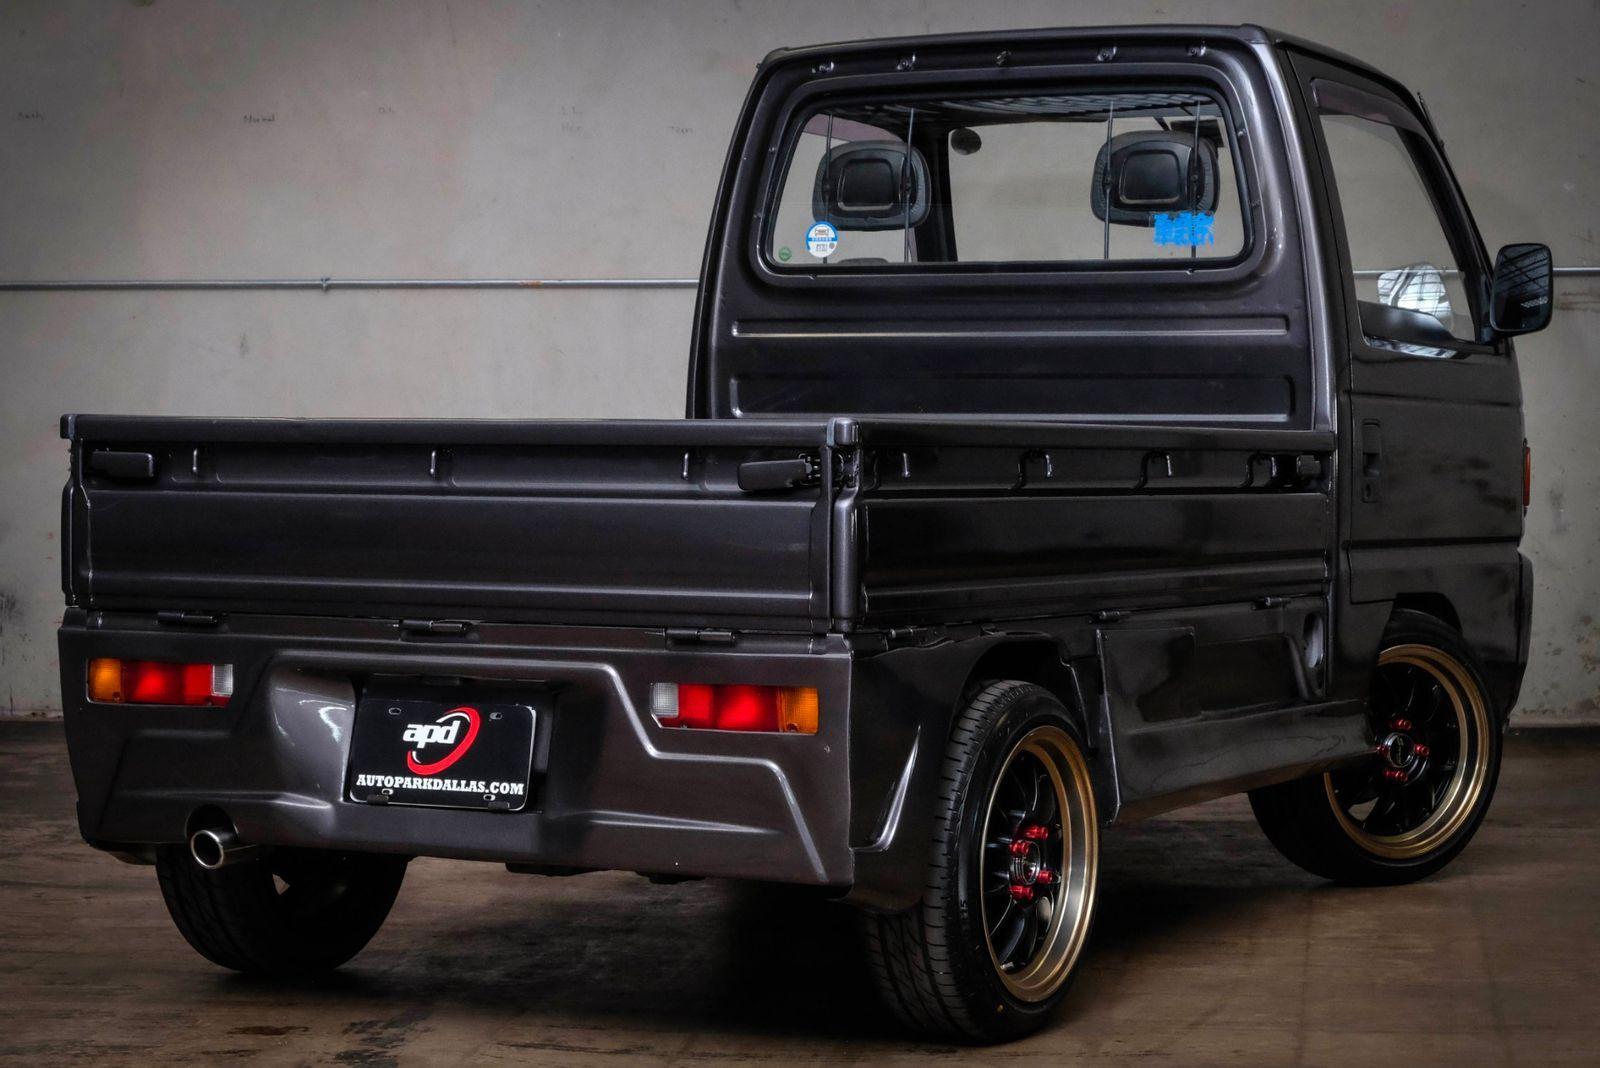 1990 Honda Acty In 2020 Honda Mini Trucks Vehicle Barriers